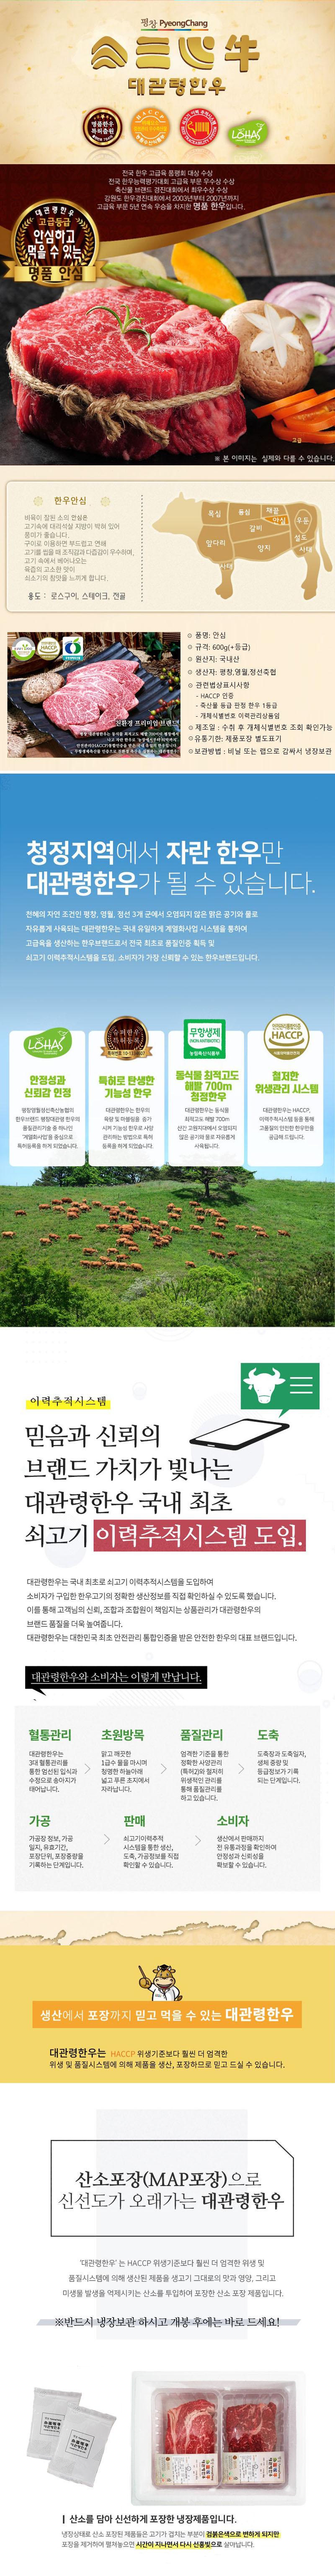 daekwoanlyenghanwoo_sang_ansim600g_1+.jpg